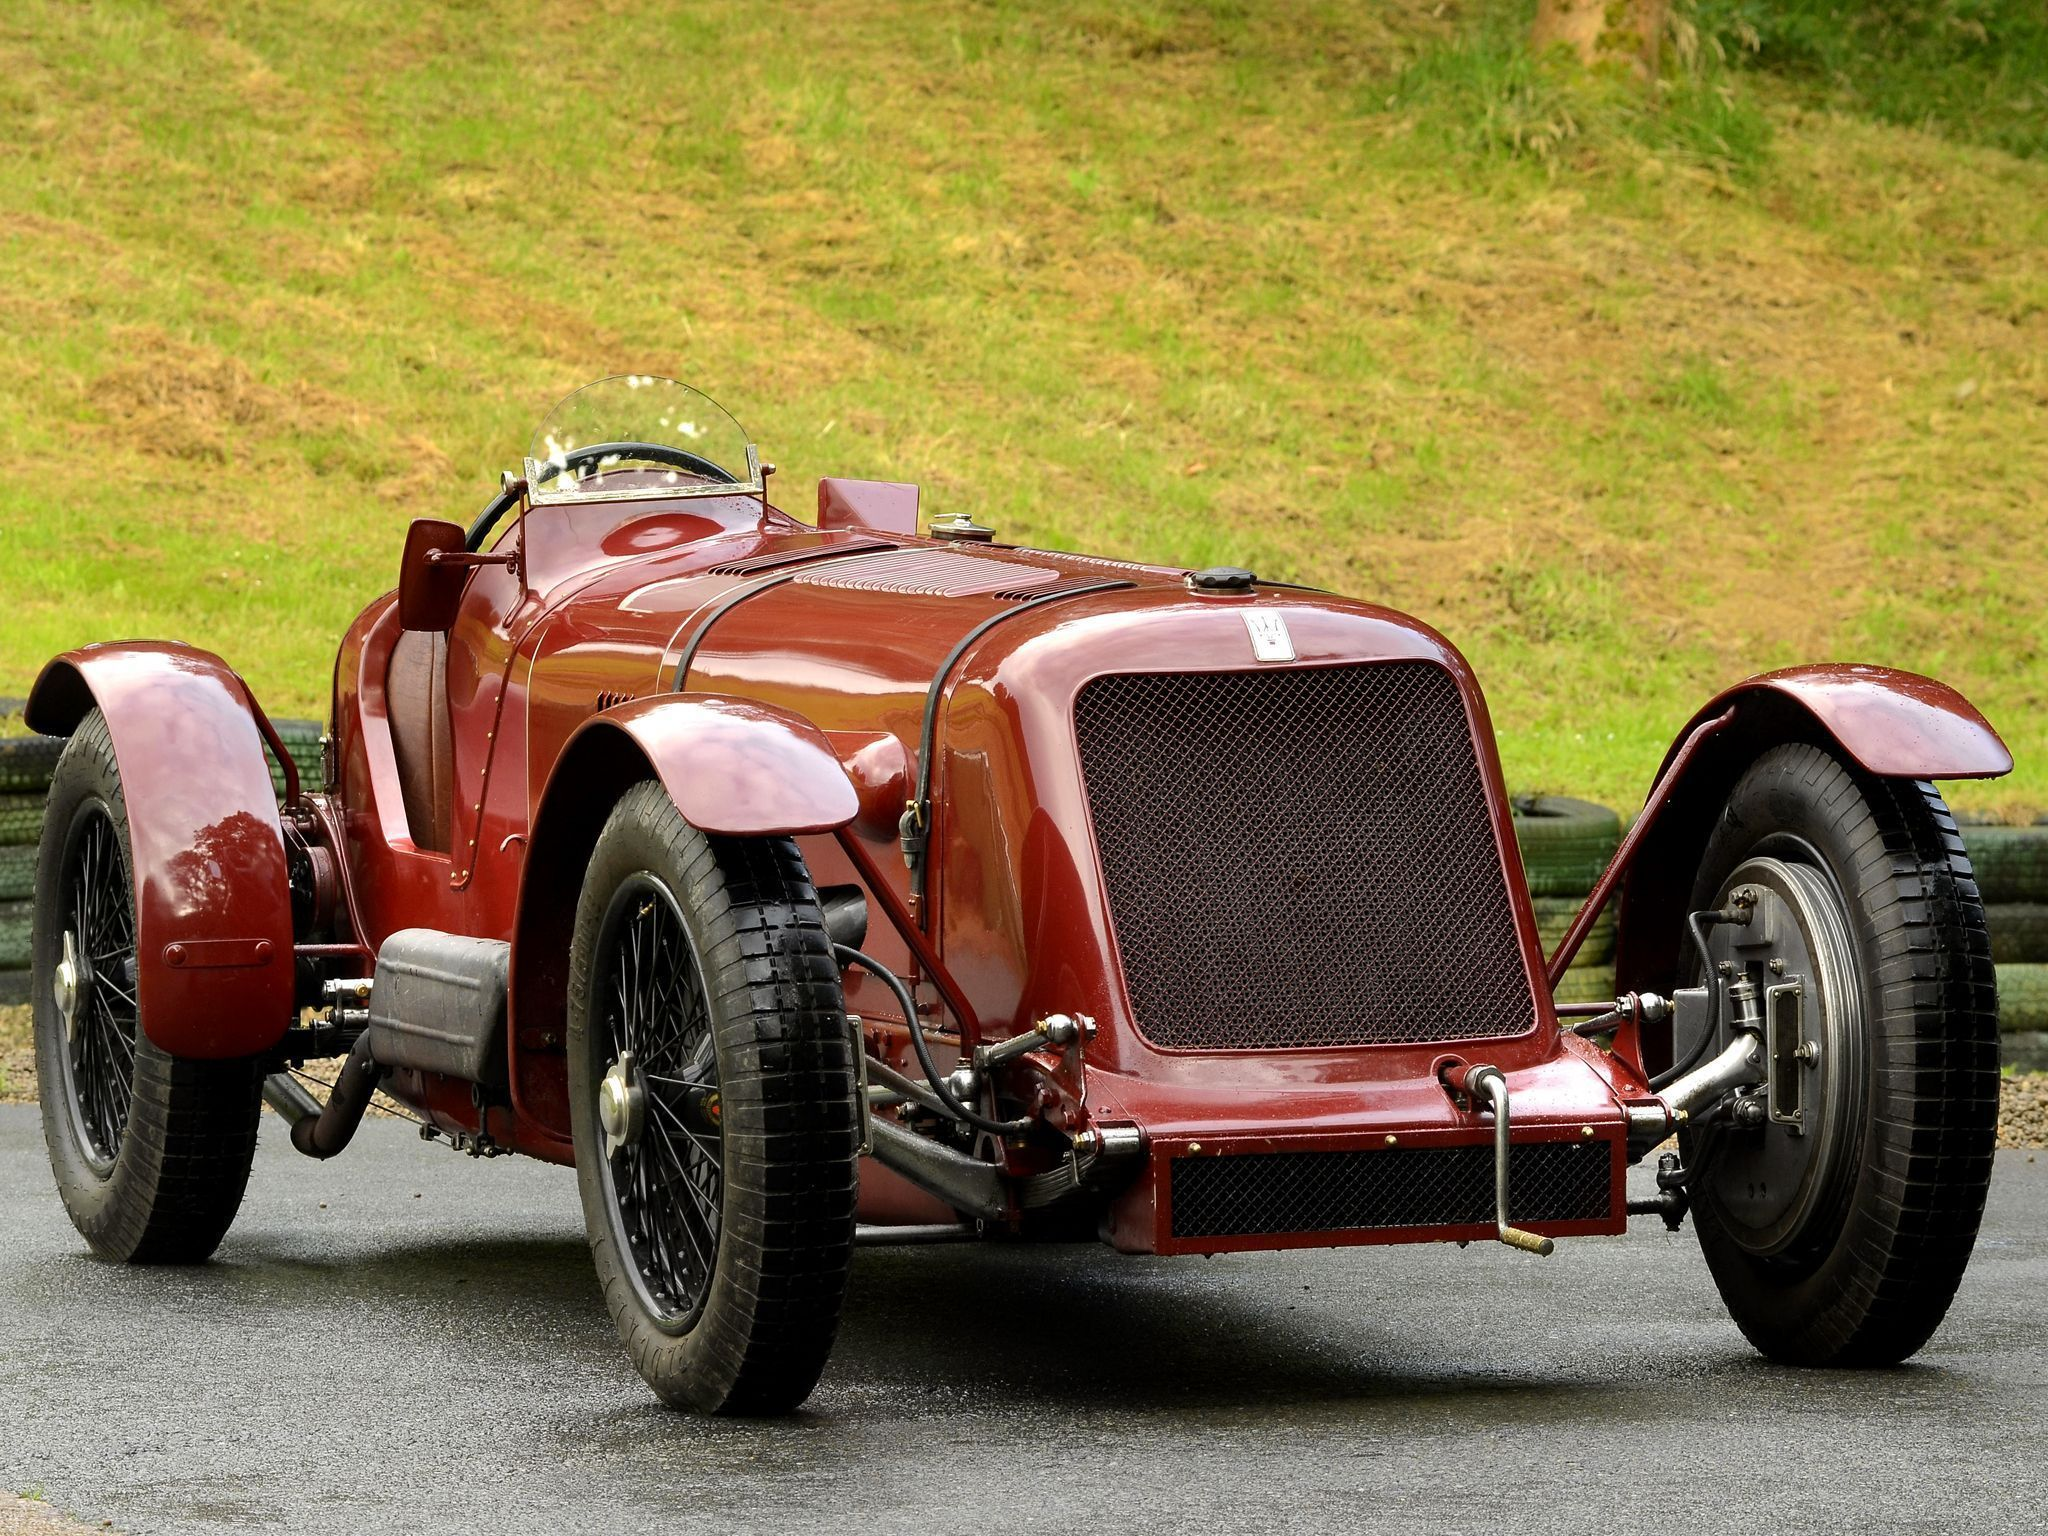 1929 Maserati Tipo V 4 Racing Car maserativintagecars